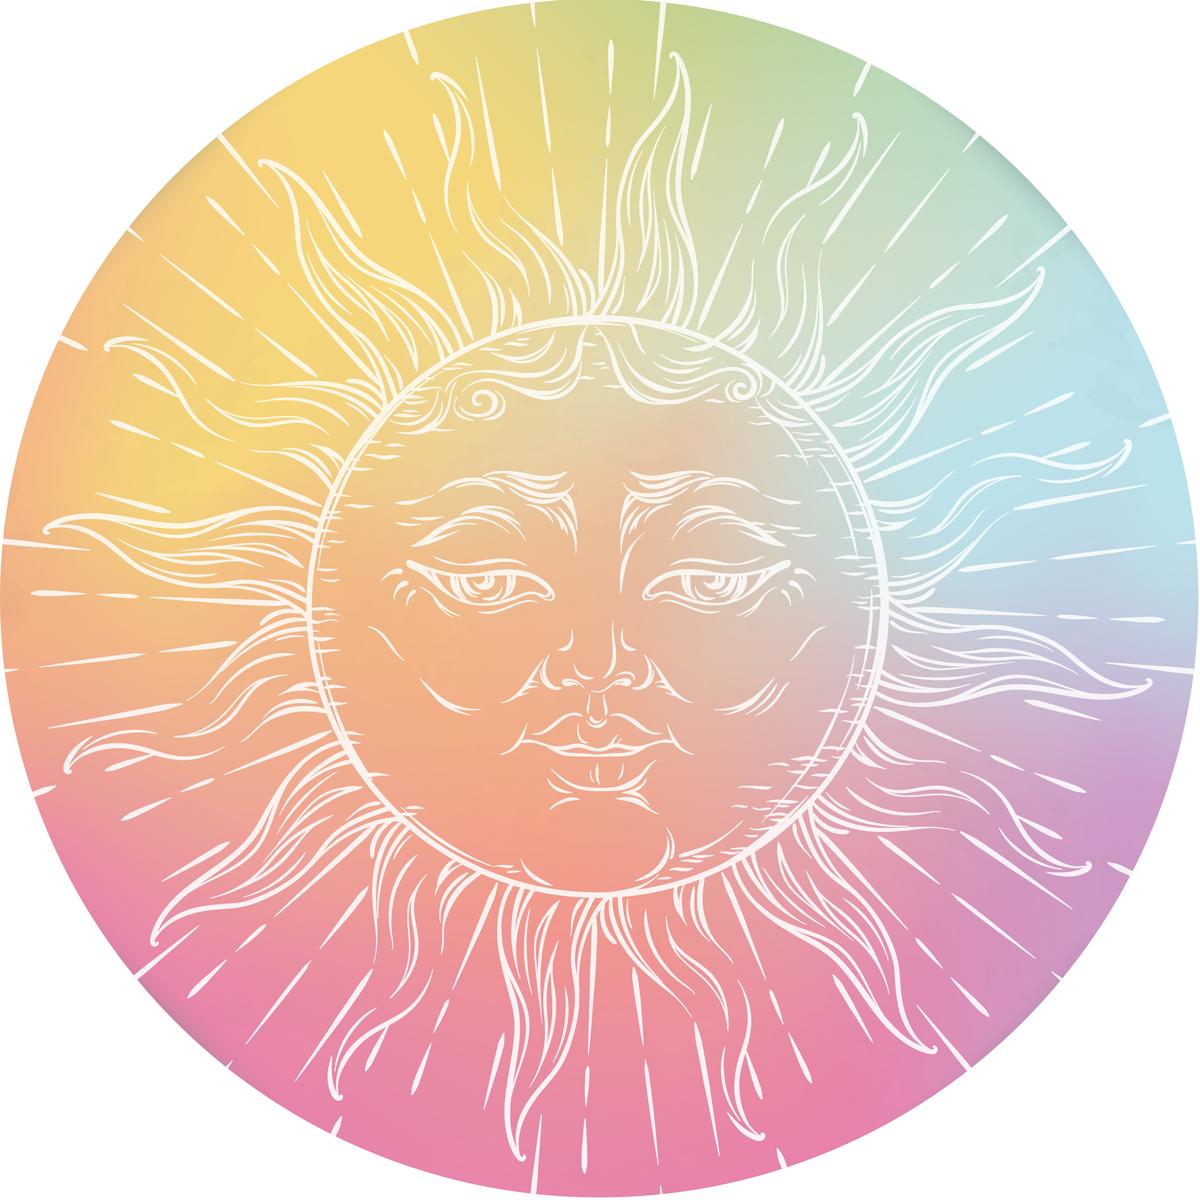 Solstice-CalendarImage-1.png